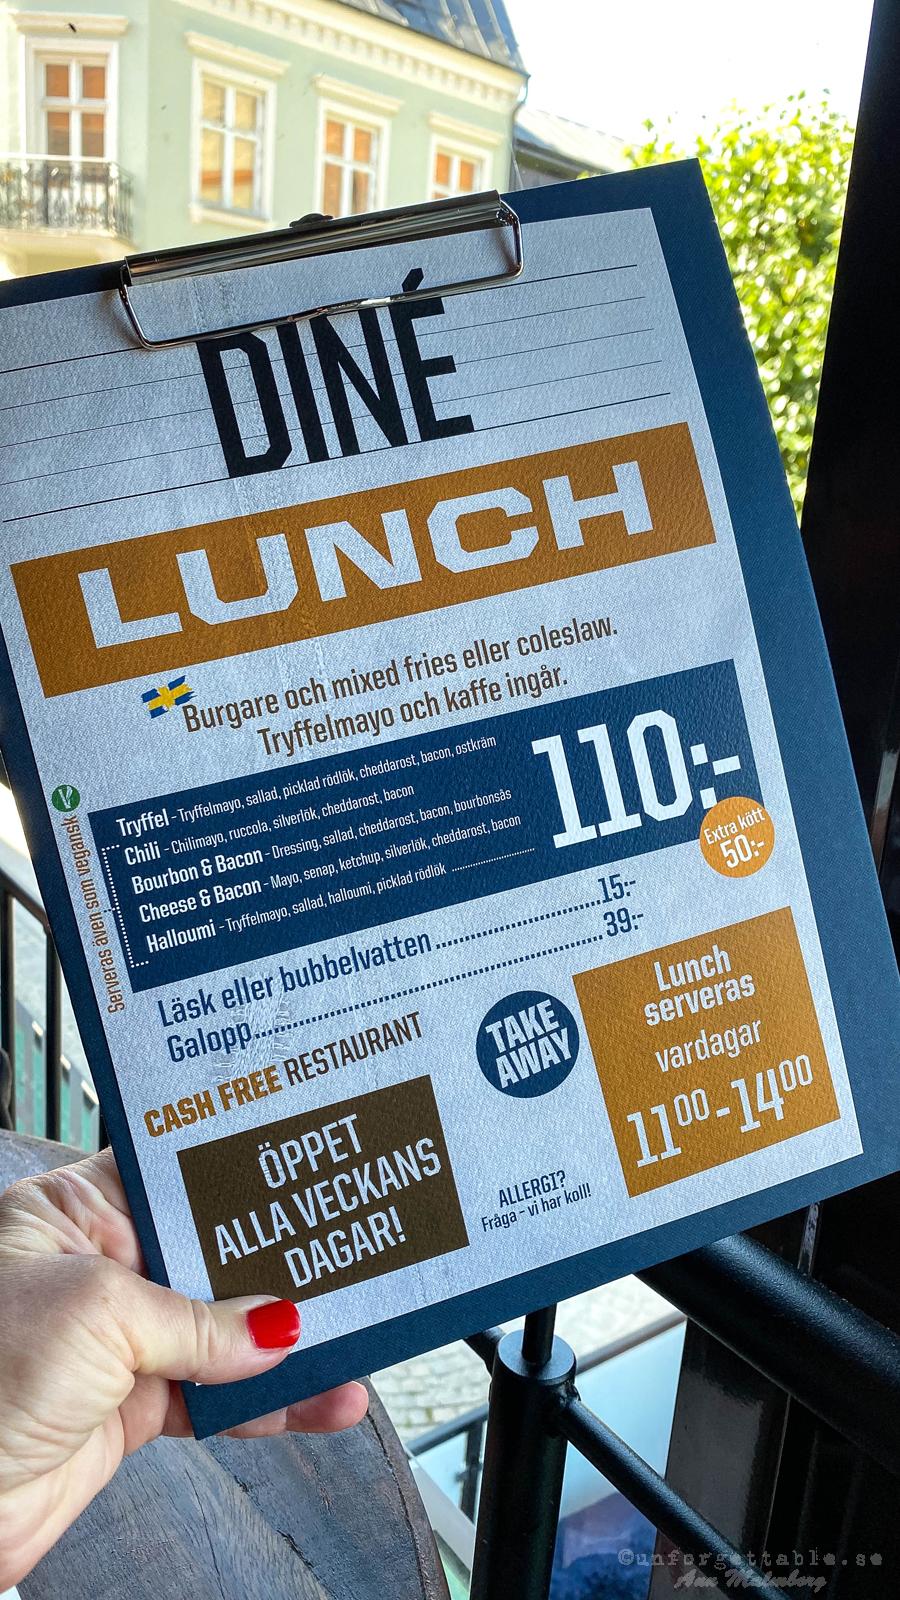 Restaurang Diné Helsingborg